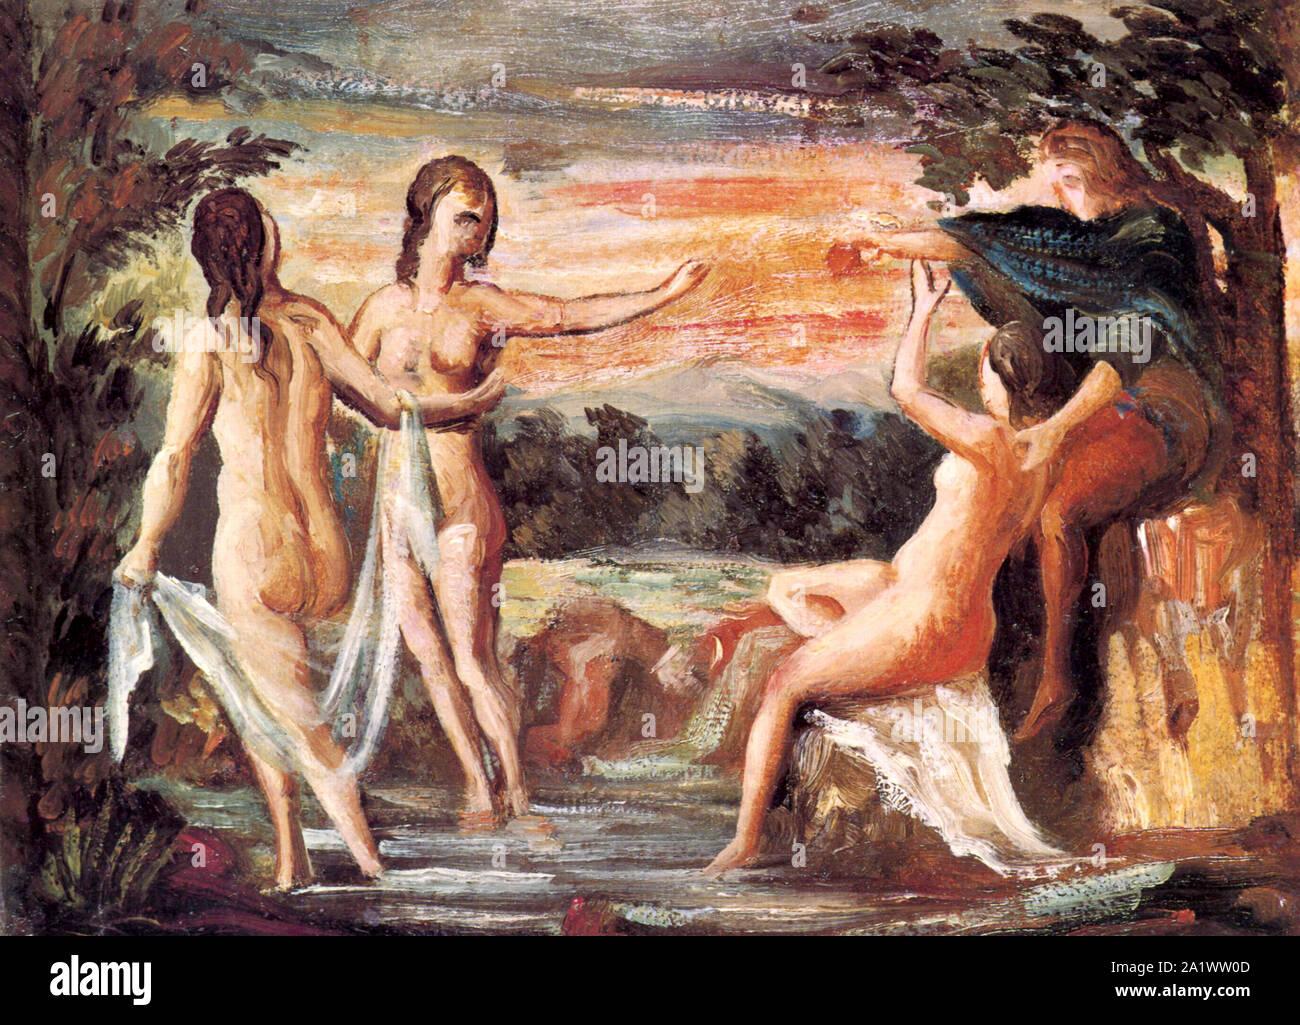 The Judgement of Paris by Paul Cezanne 1864 Stock Photo